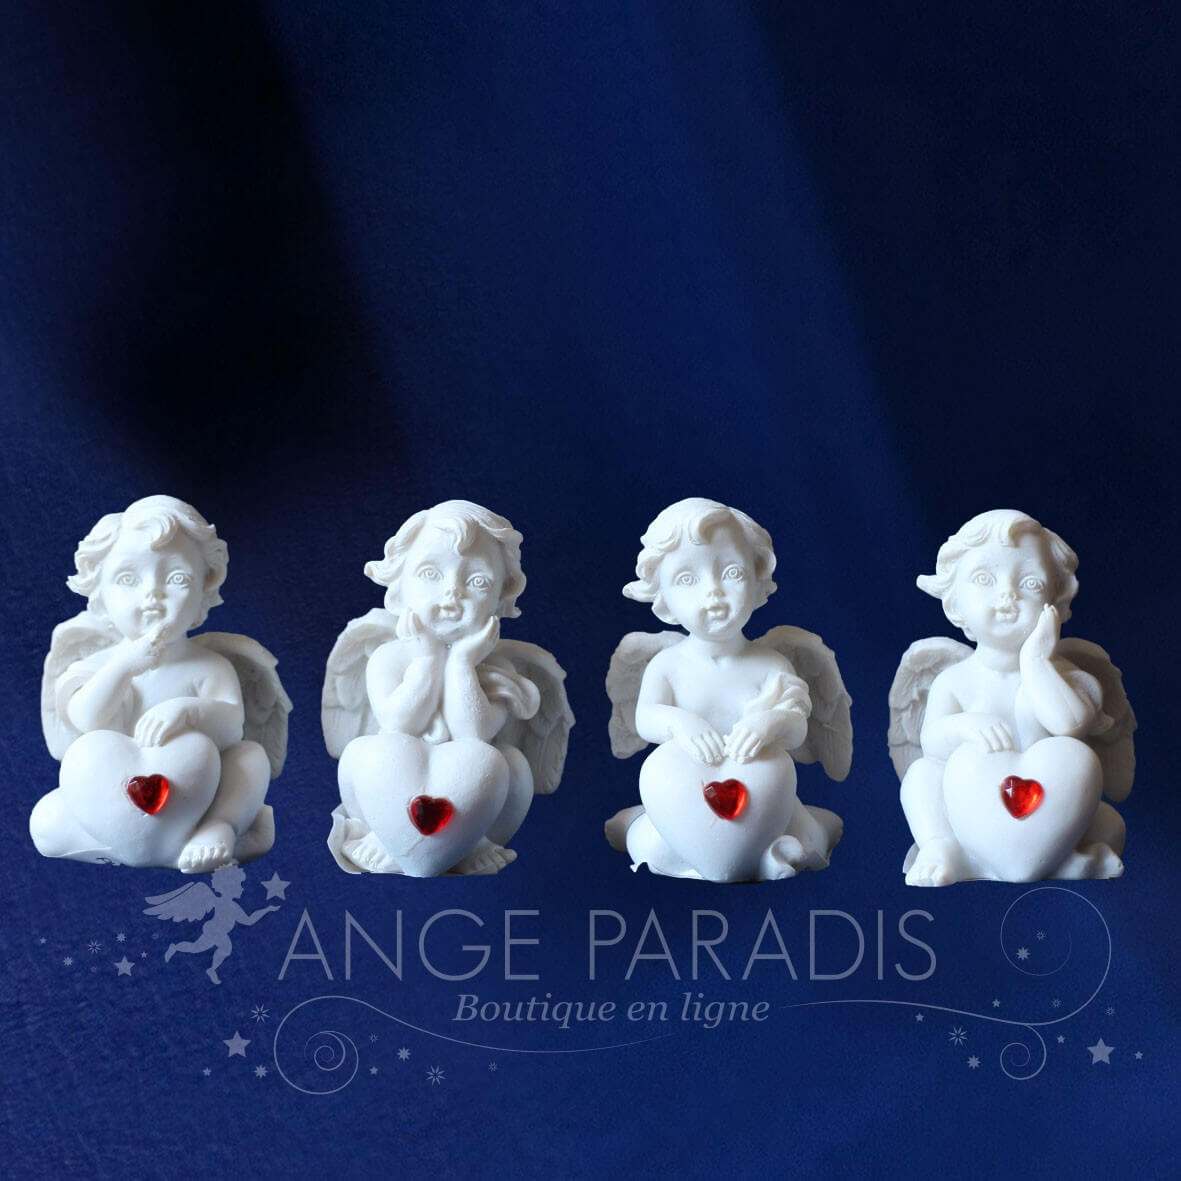 4 ANGELOTS AVEC COEUR ROUGE